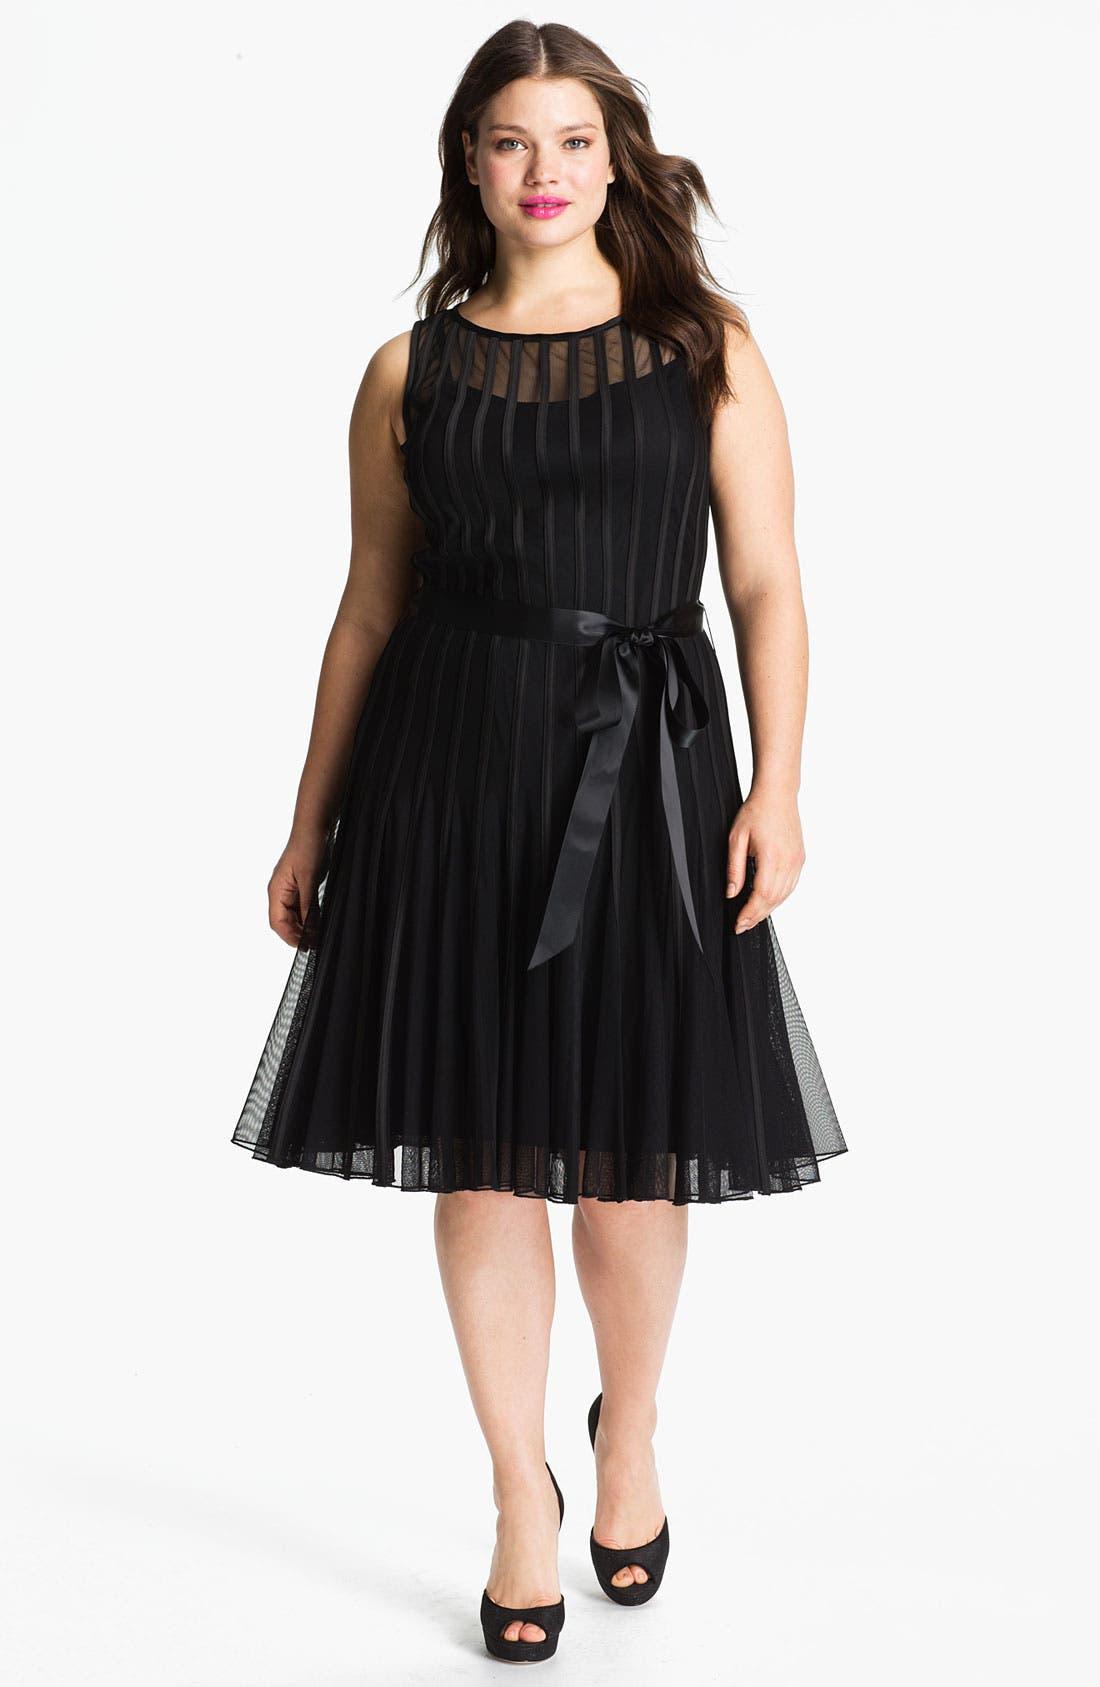 Alternate Image 1 Selected - Xscape Sleeveless Satin Stripe Mesh Dress (Plus Size)